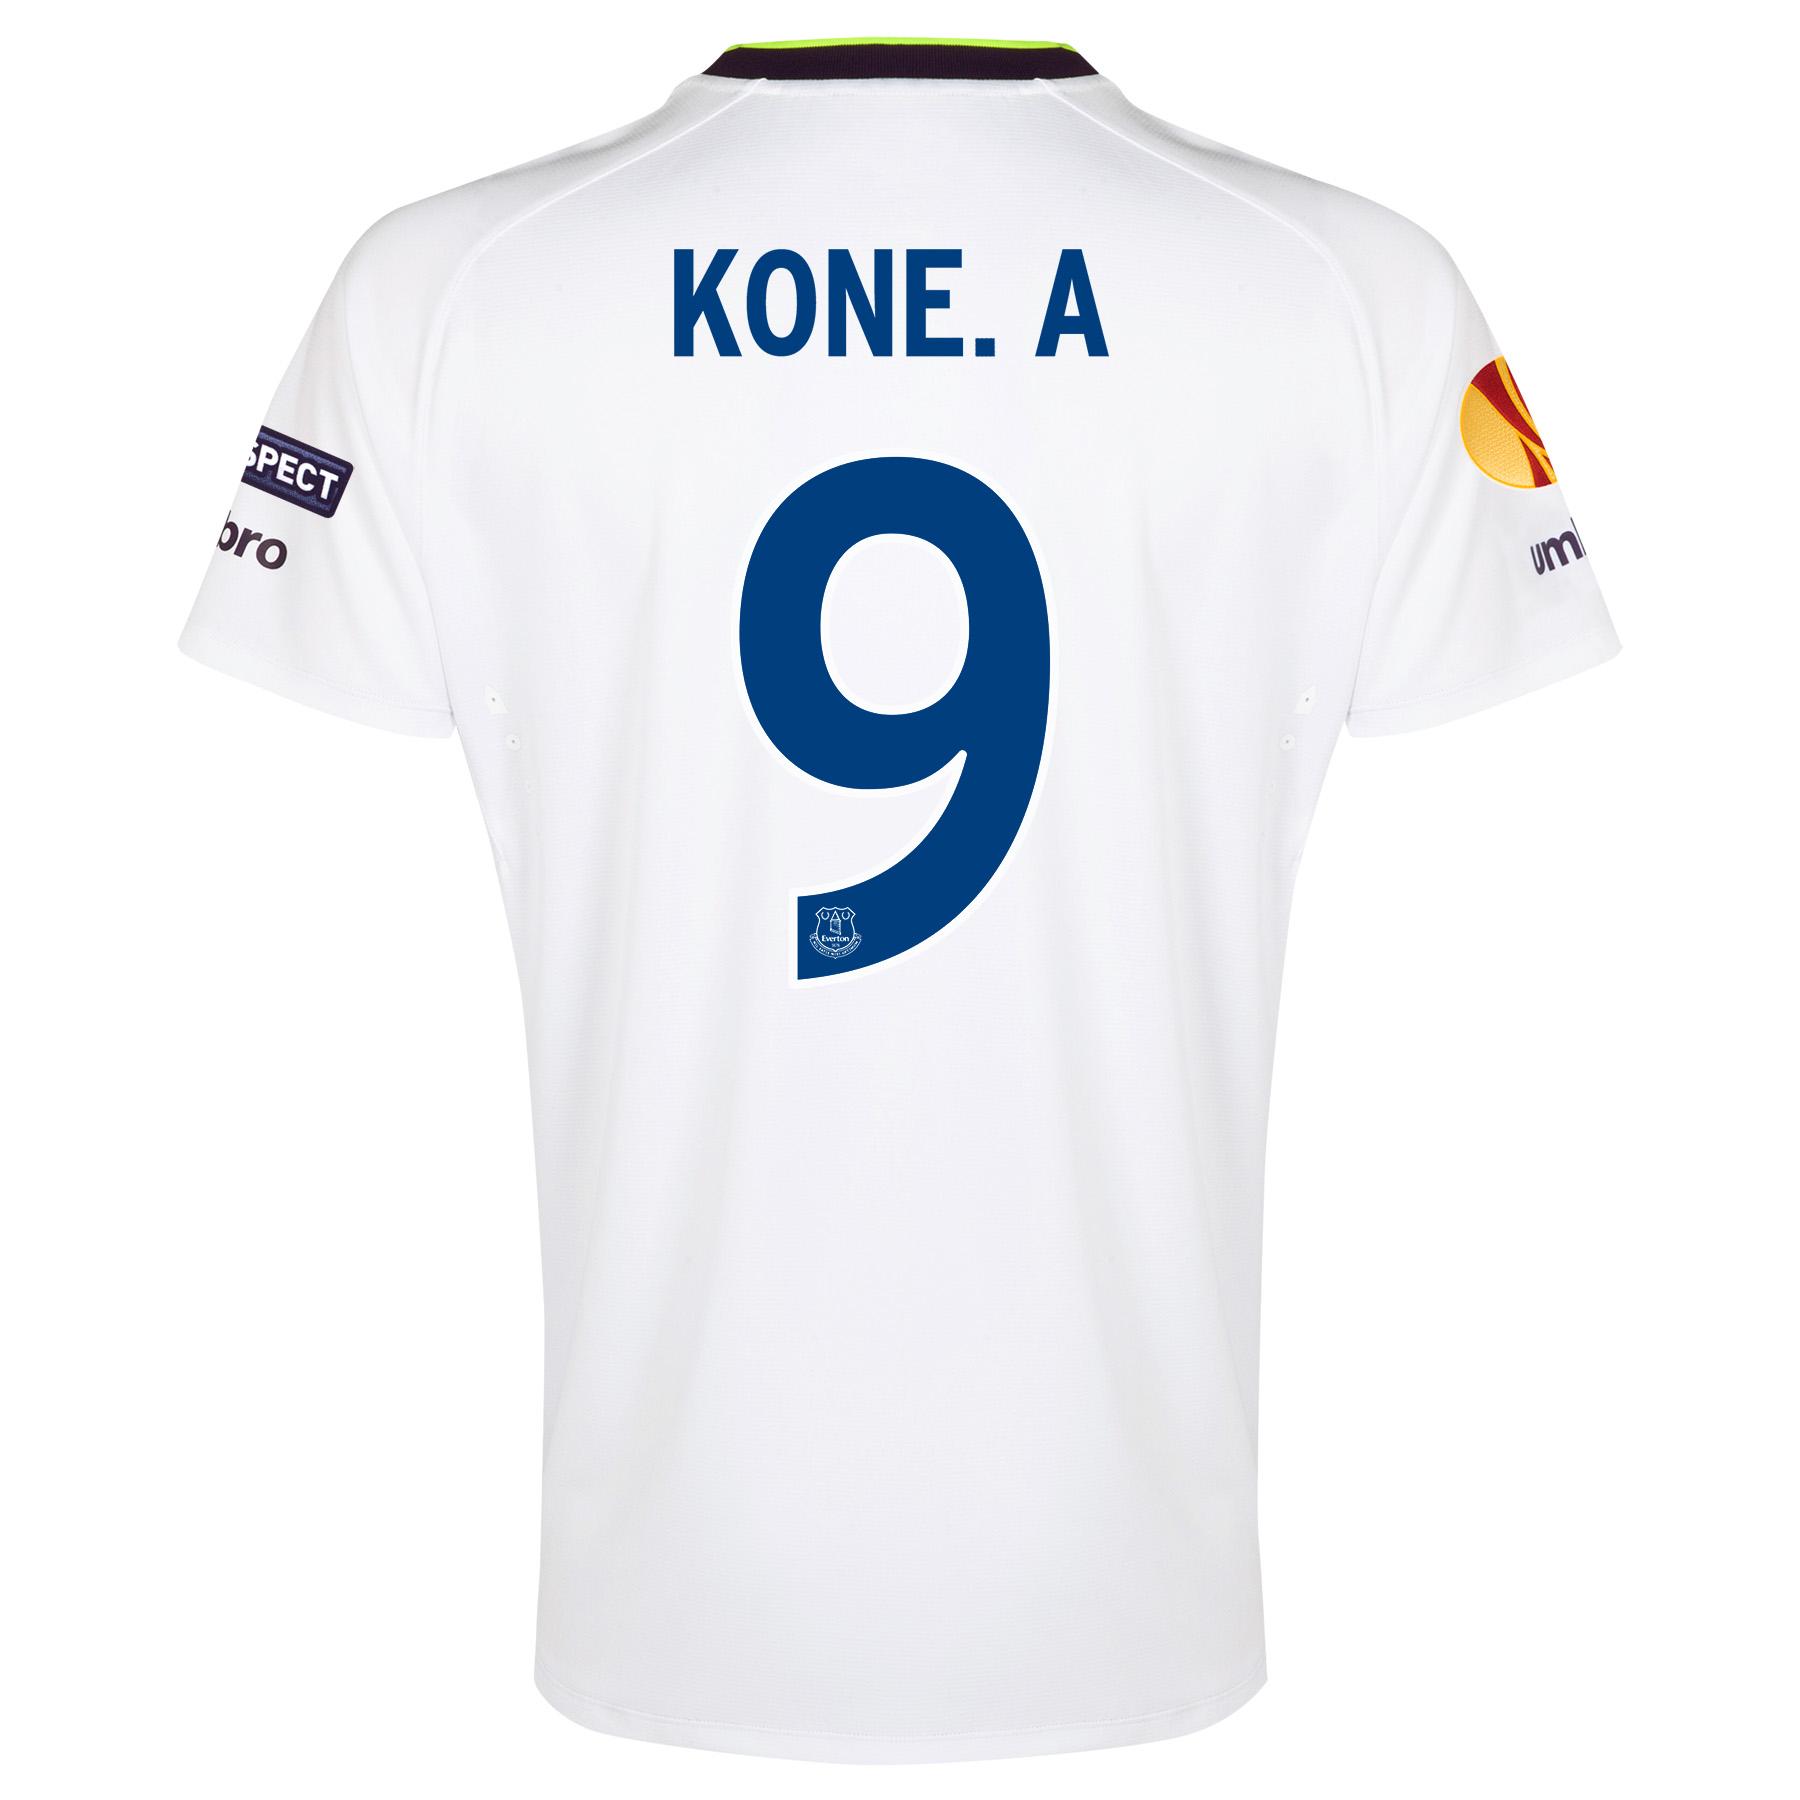 Everton UEFA Europa League 3rd Shirt 2014/15 with Kone.A 9 printing